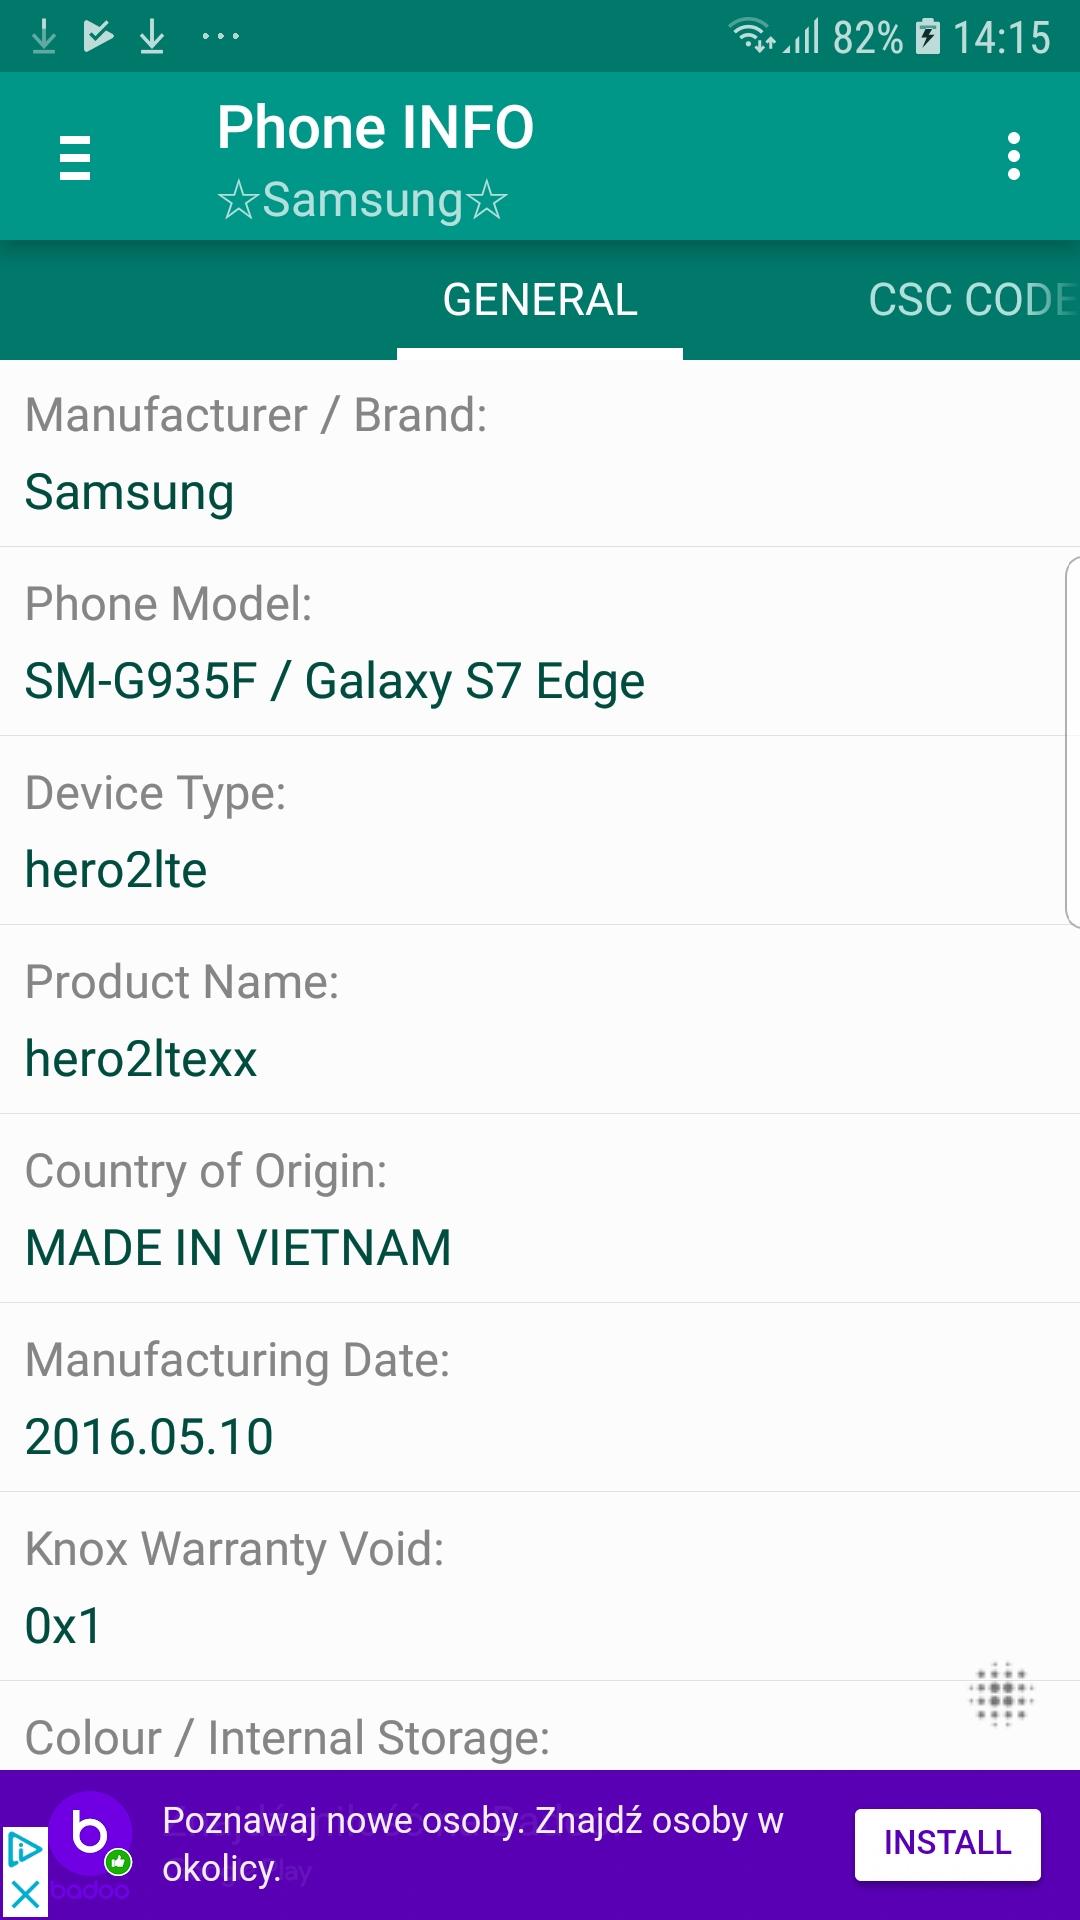 Galaxy S7 Edge return to full stock - Samsung Galaxy S7 Edge